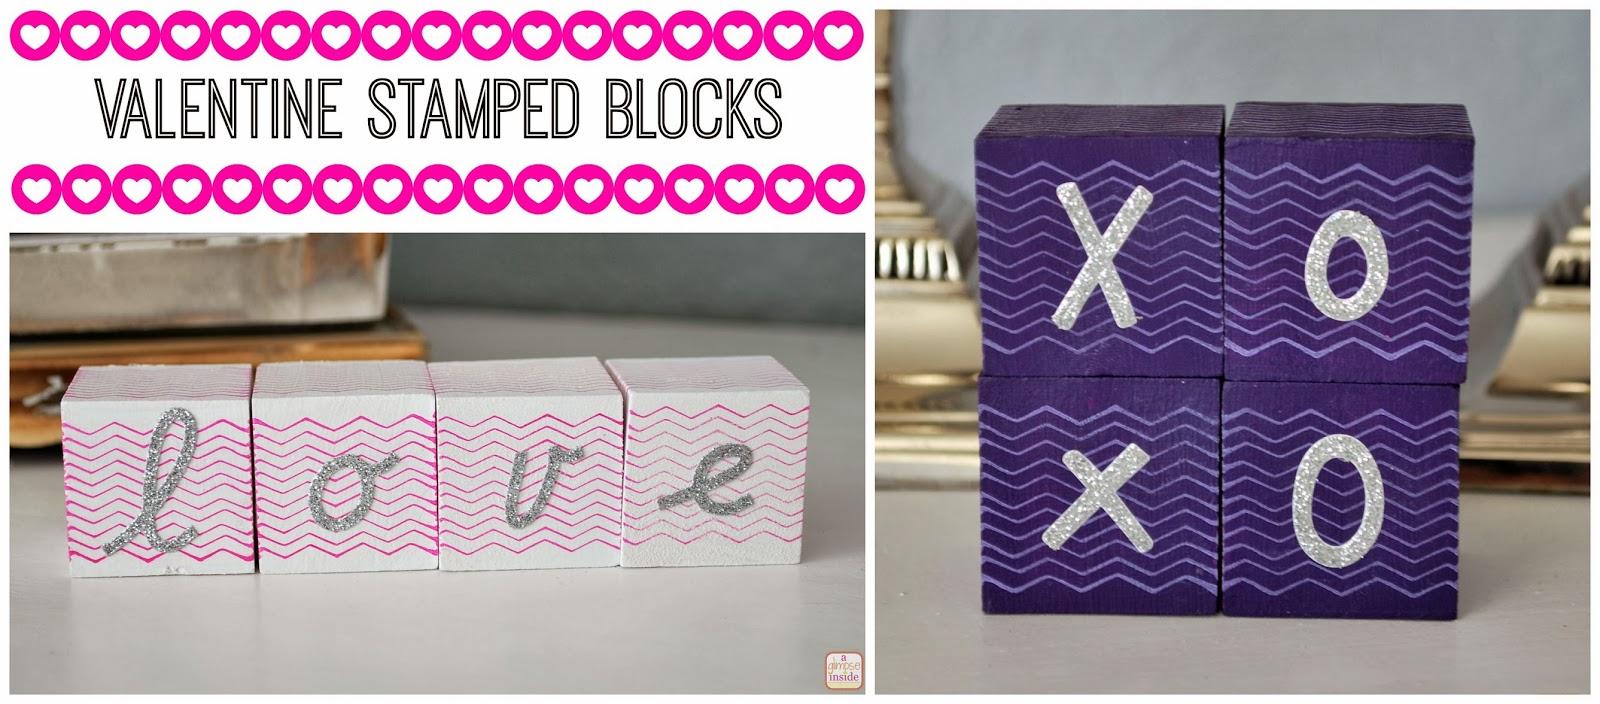 http://www.aglimpseinsideblog.com/2014/02/easy-valentine-stamped-blocks.html